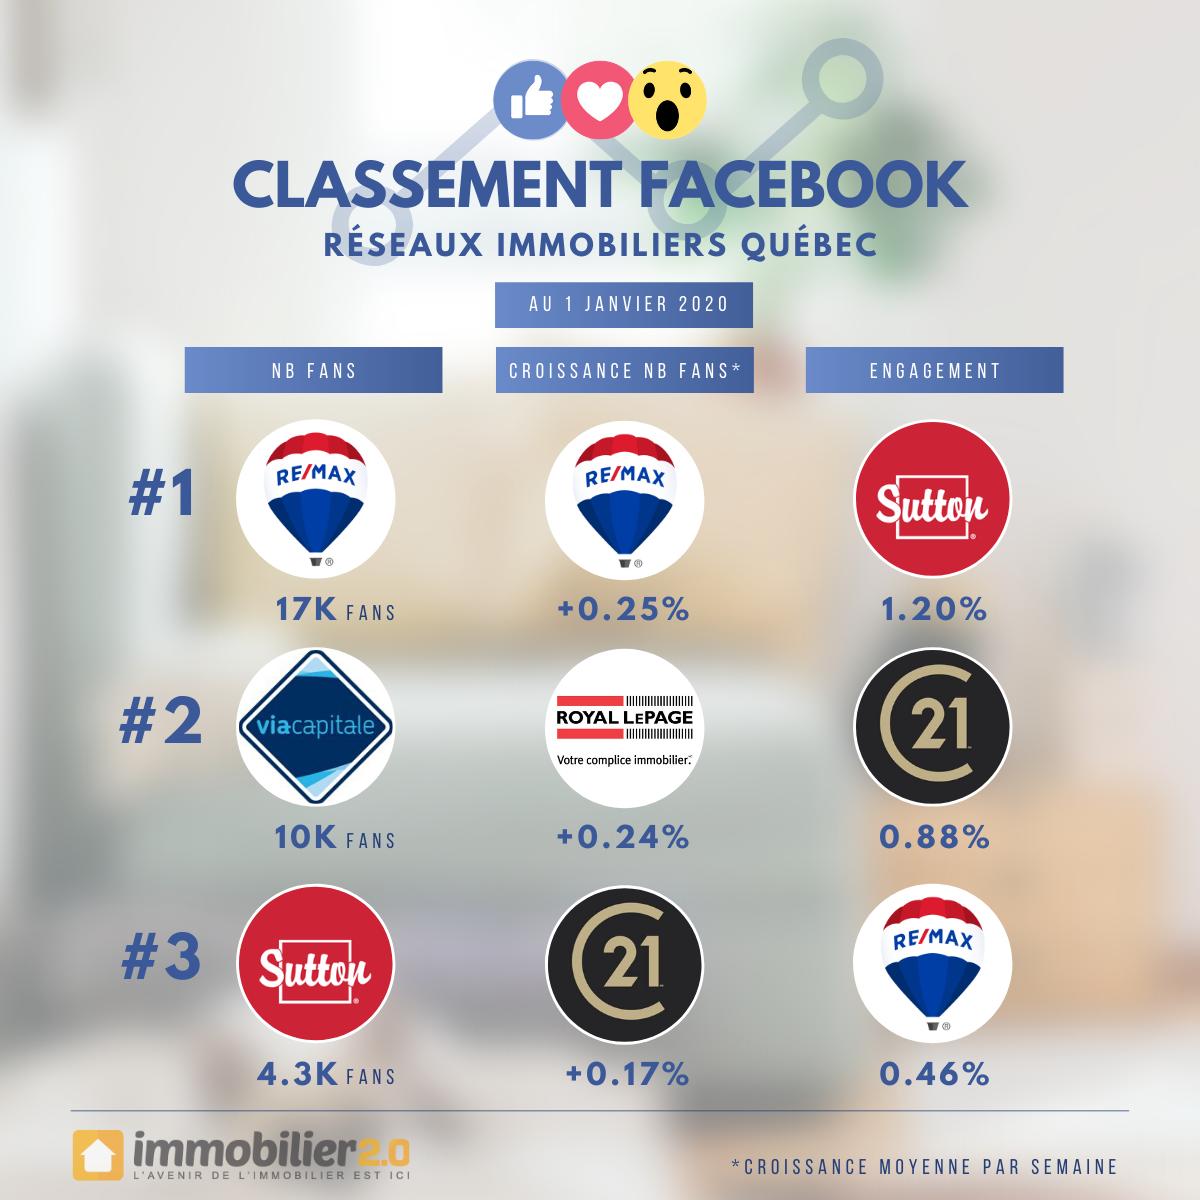 Classement Facebook Marques Immobiliers Quebec Janvier 2020